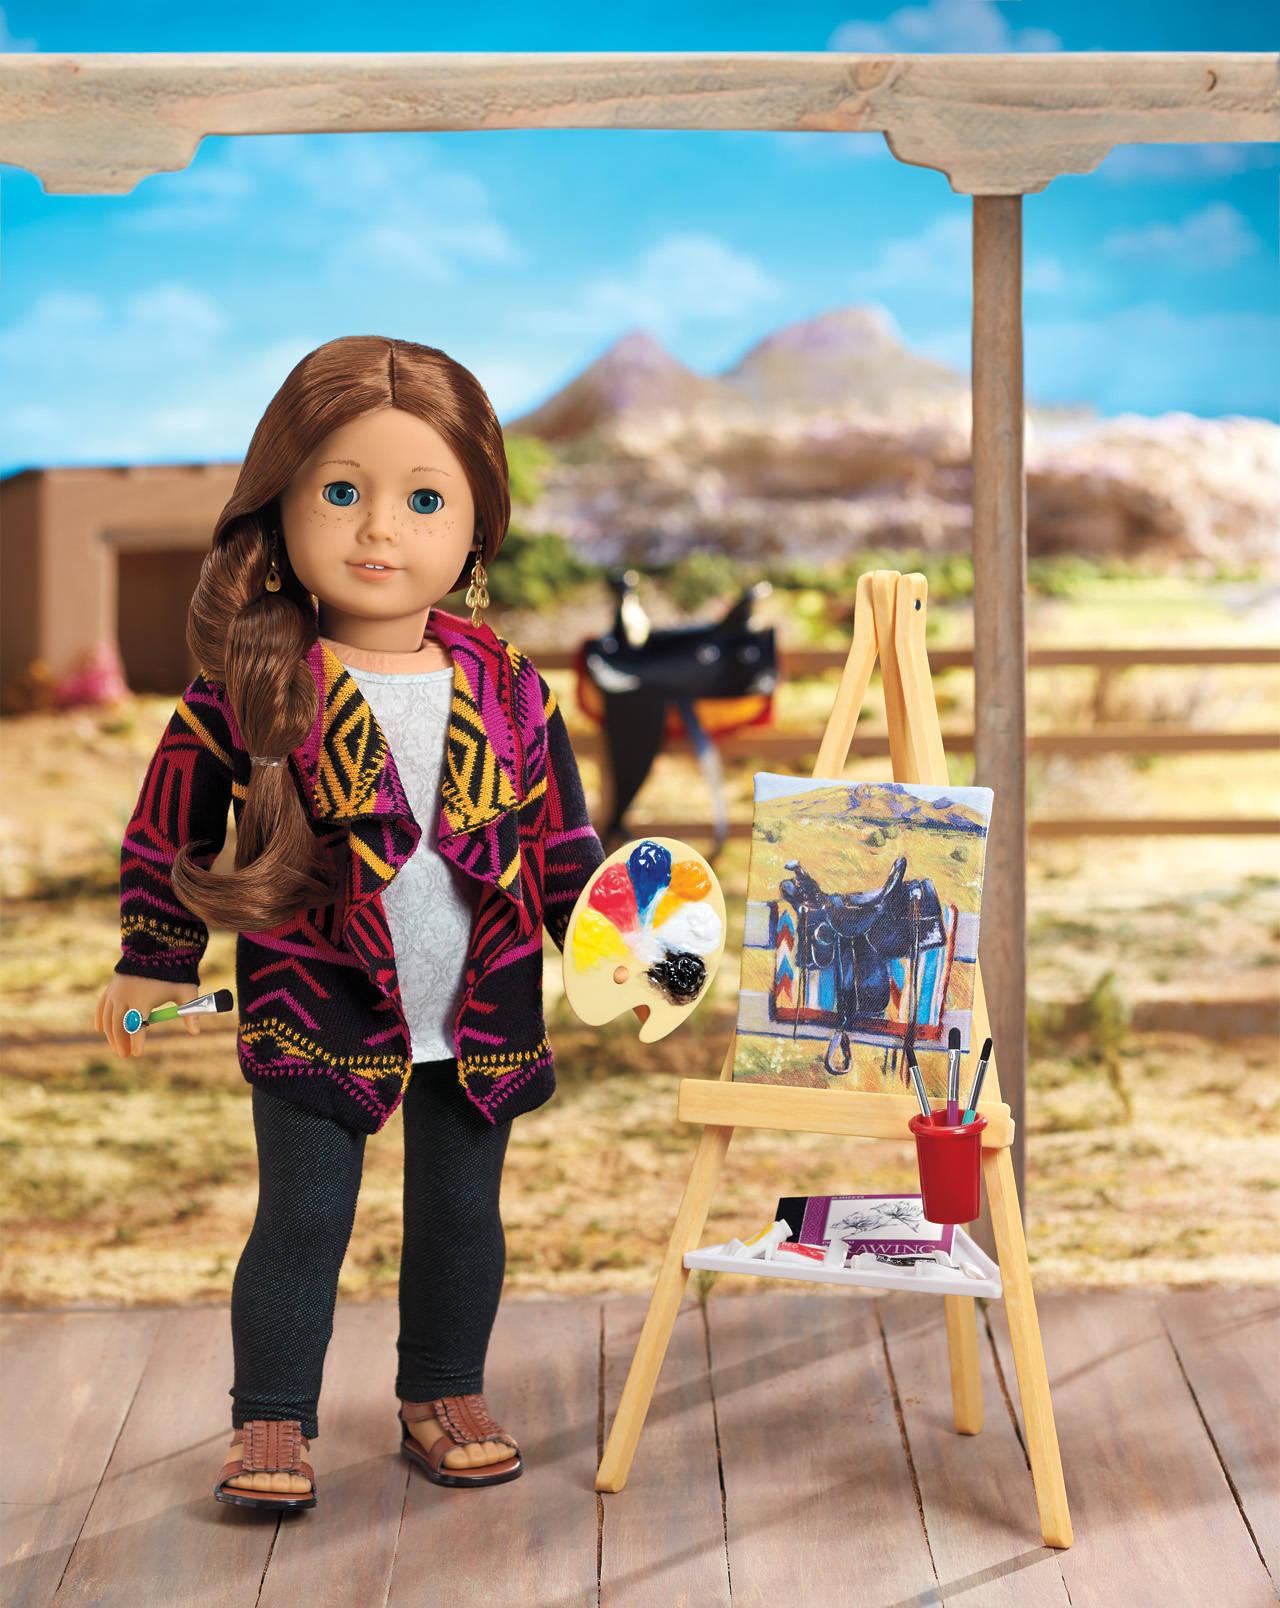 American Girl Doll Basic Knit Dress Pattern And Tutorial: American Girl Doll